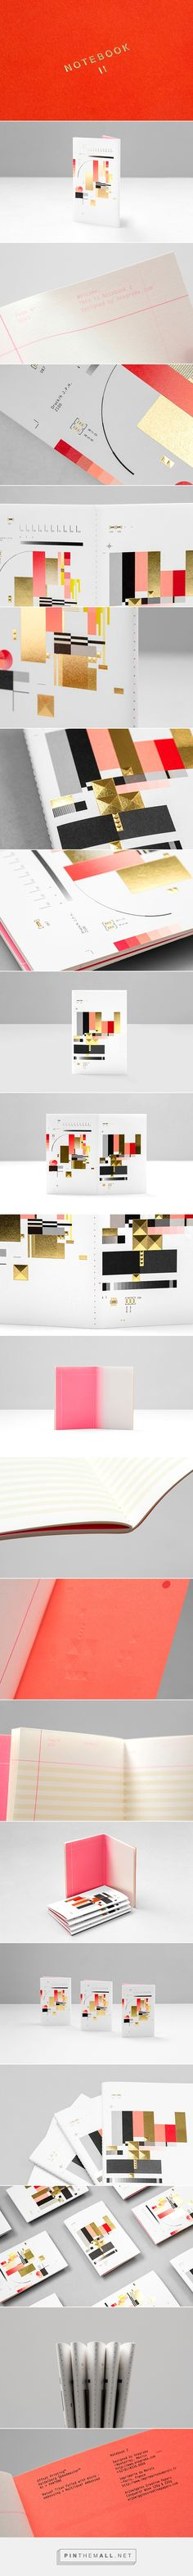 Imprimerie du Marais Notebook 2 on Behance